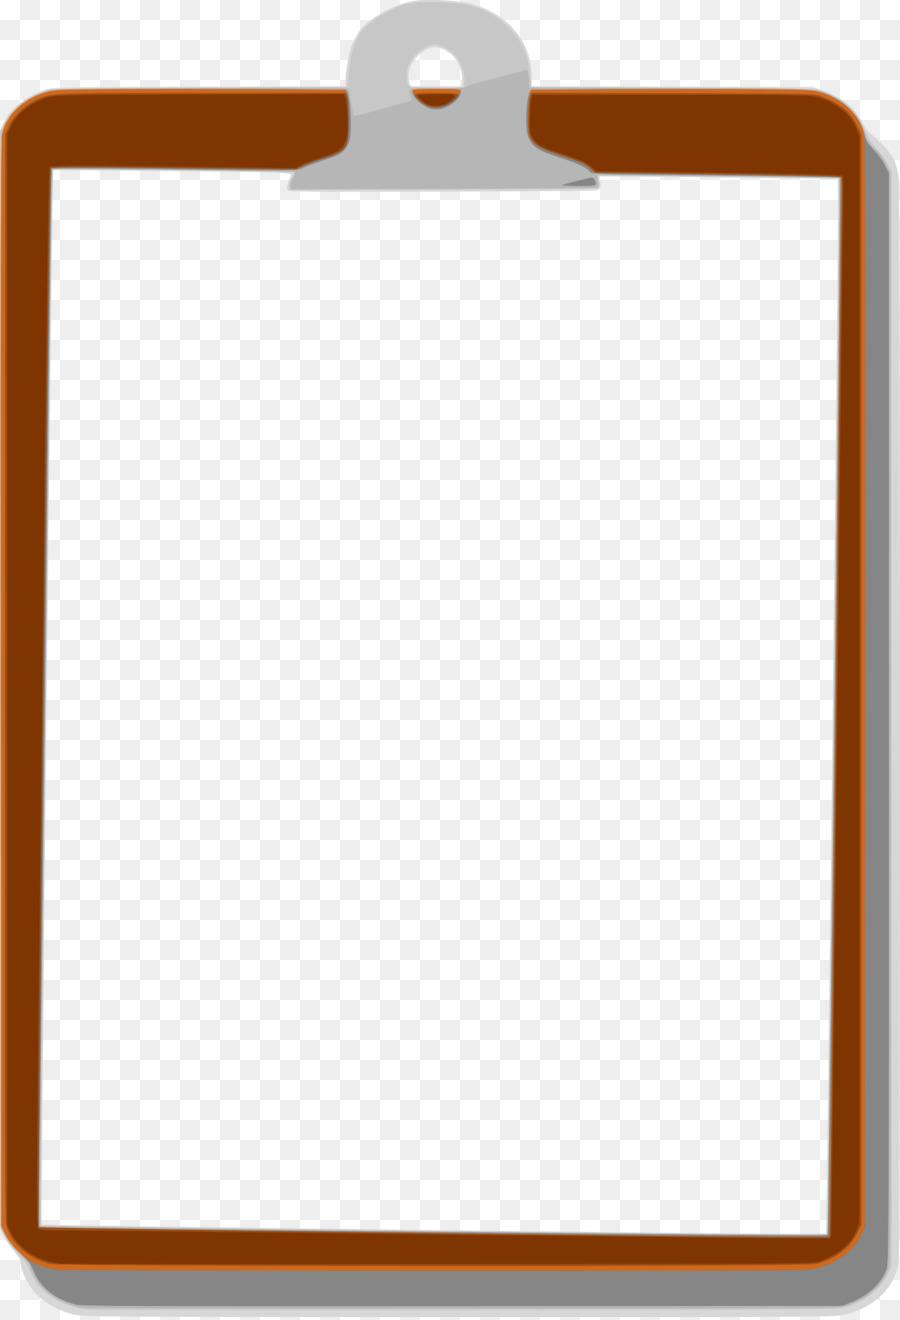 Clipboard Desktop Wallpaper Computer Icons Clip art - clipboard png ...